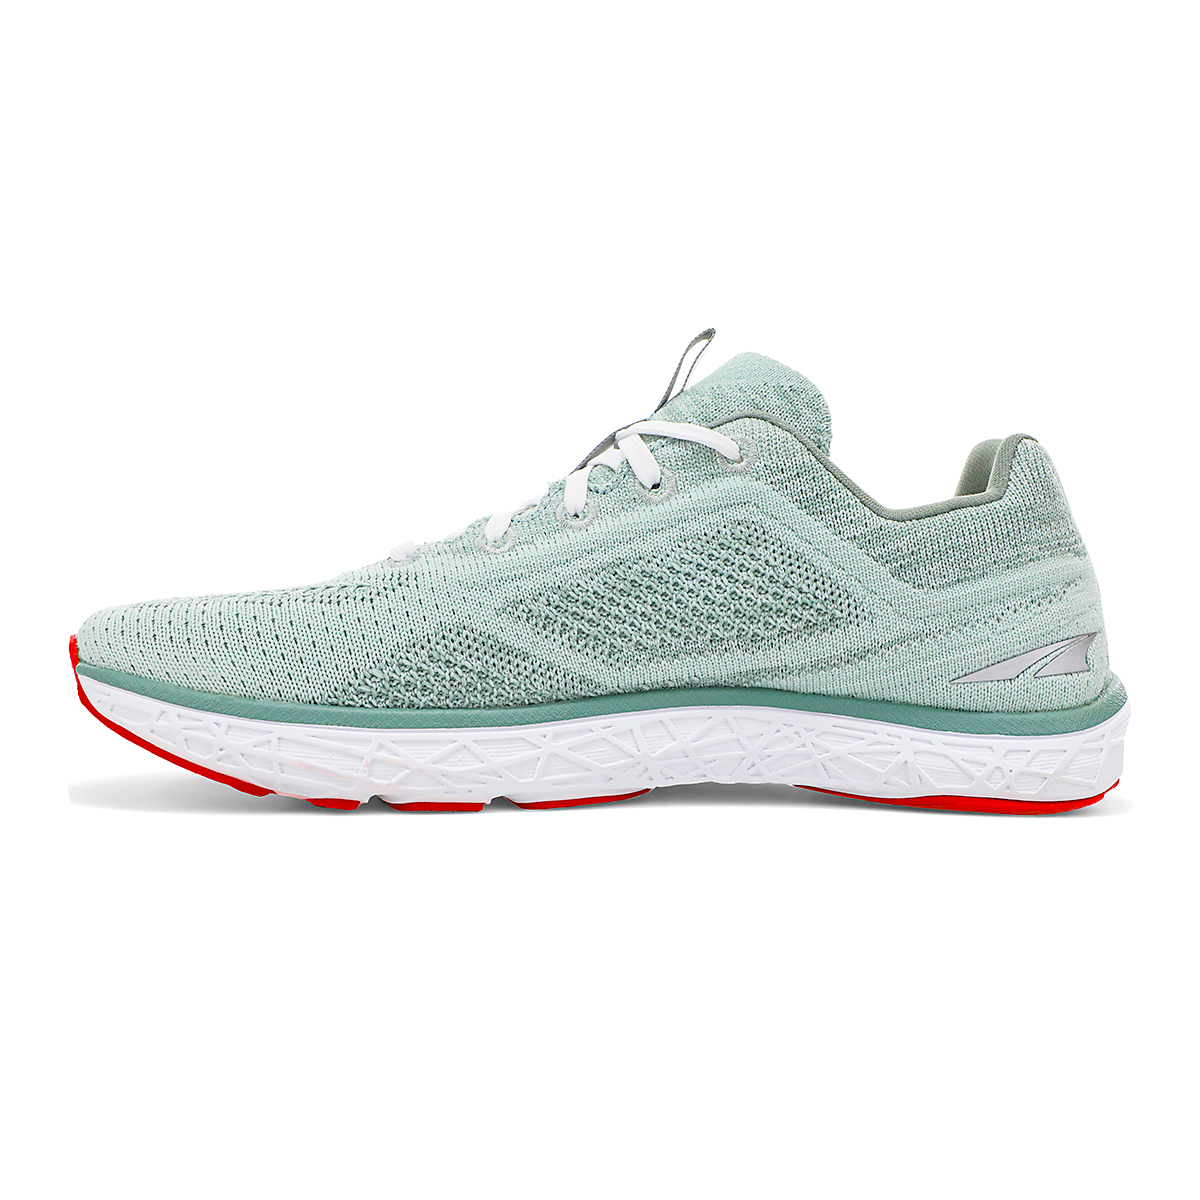 Women's Altra Escalante 2.5 Running Shoe - Color: Light Green - Size: 5.5 - Width: Regular, Light Green, large, image 2